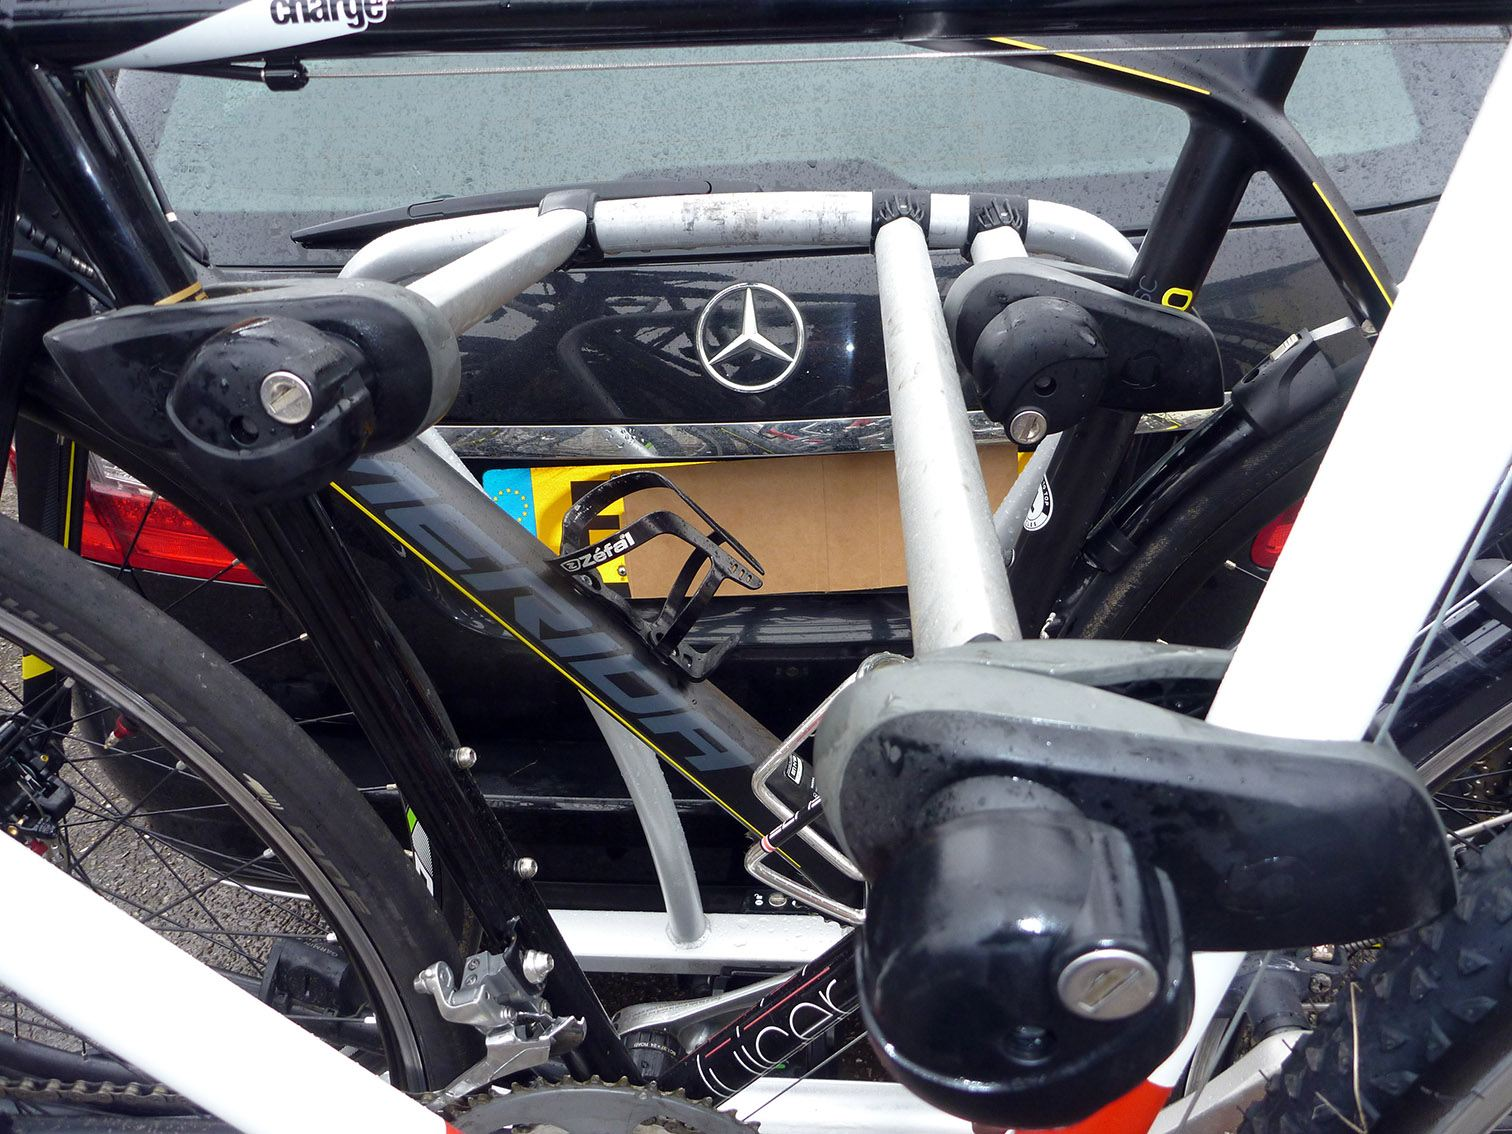 Review: Whispbar WBT31 3 bike tow bar carrier | road cc